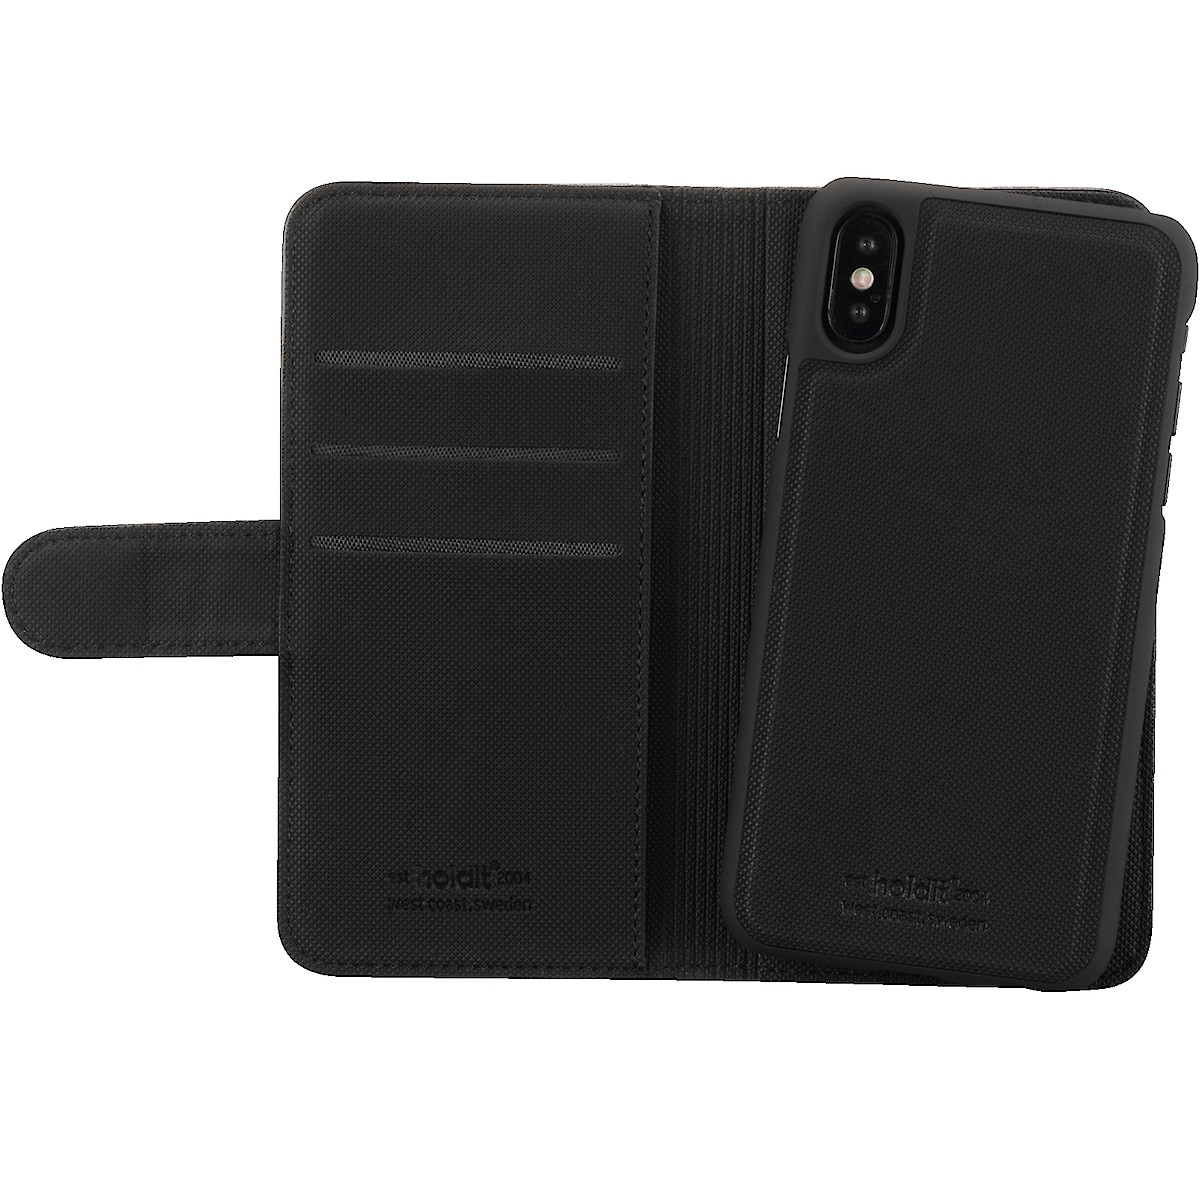 Plånboksfodral för iPhone X/XS, Holdit